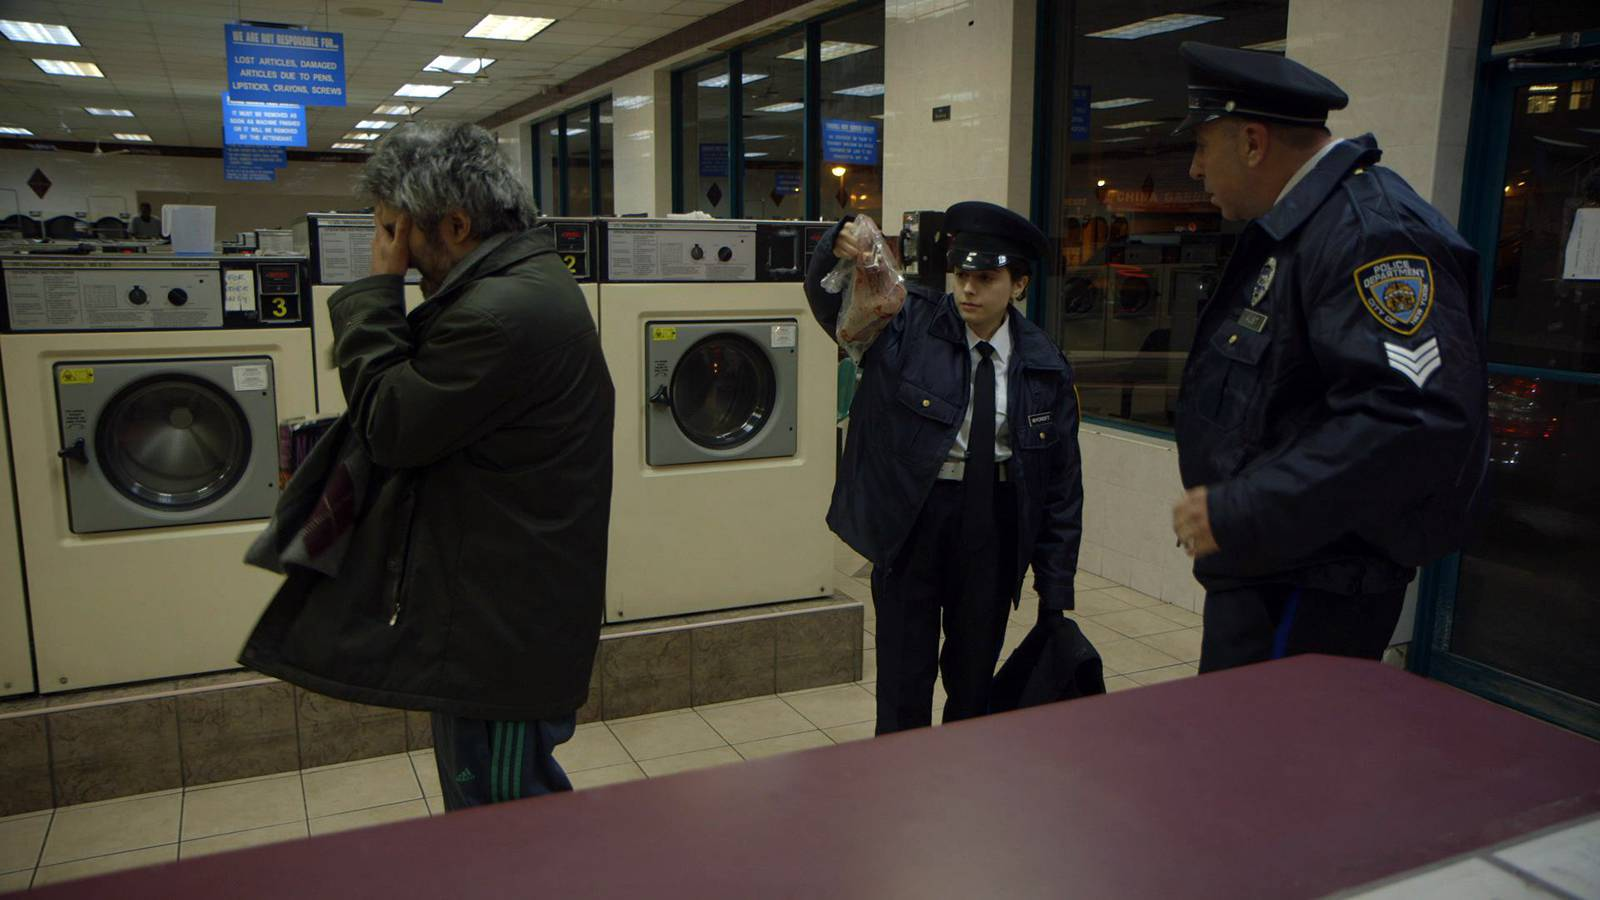 Onur Tukel, Kevin Scanlon, and Ariel Kavoussi in Applesauce (2015)